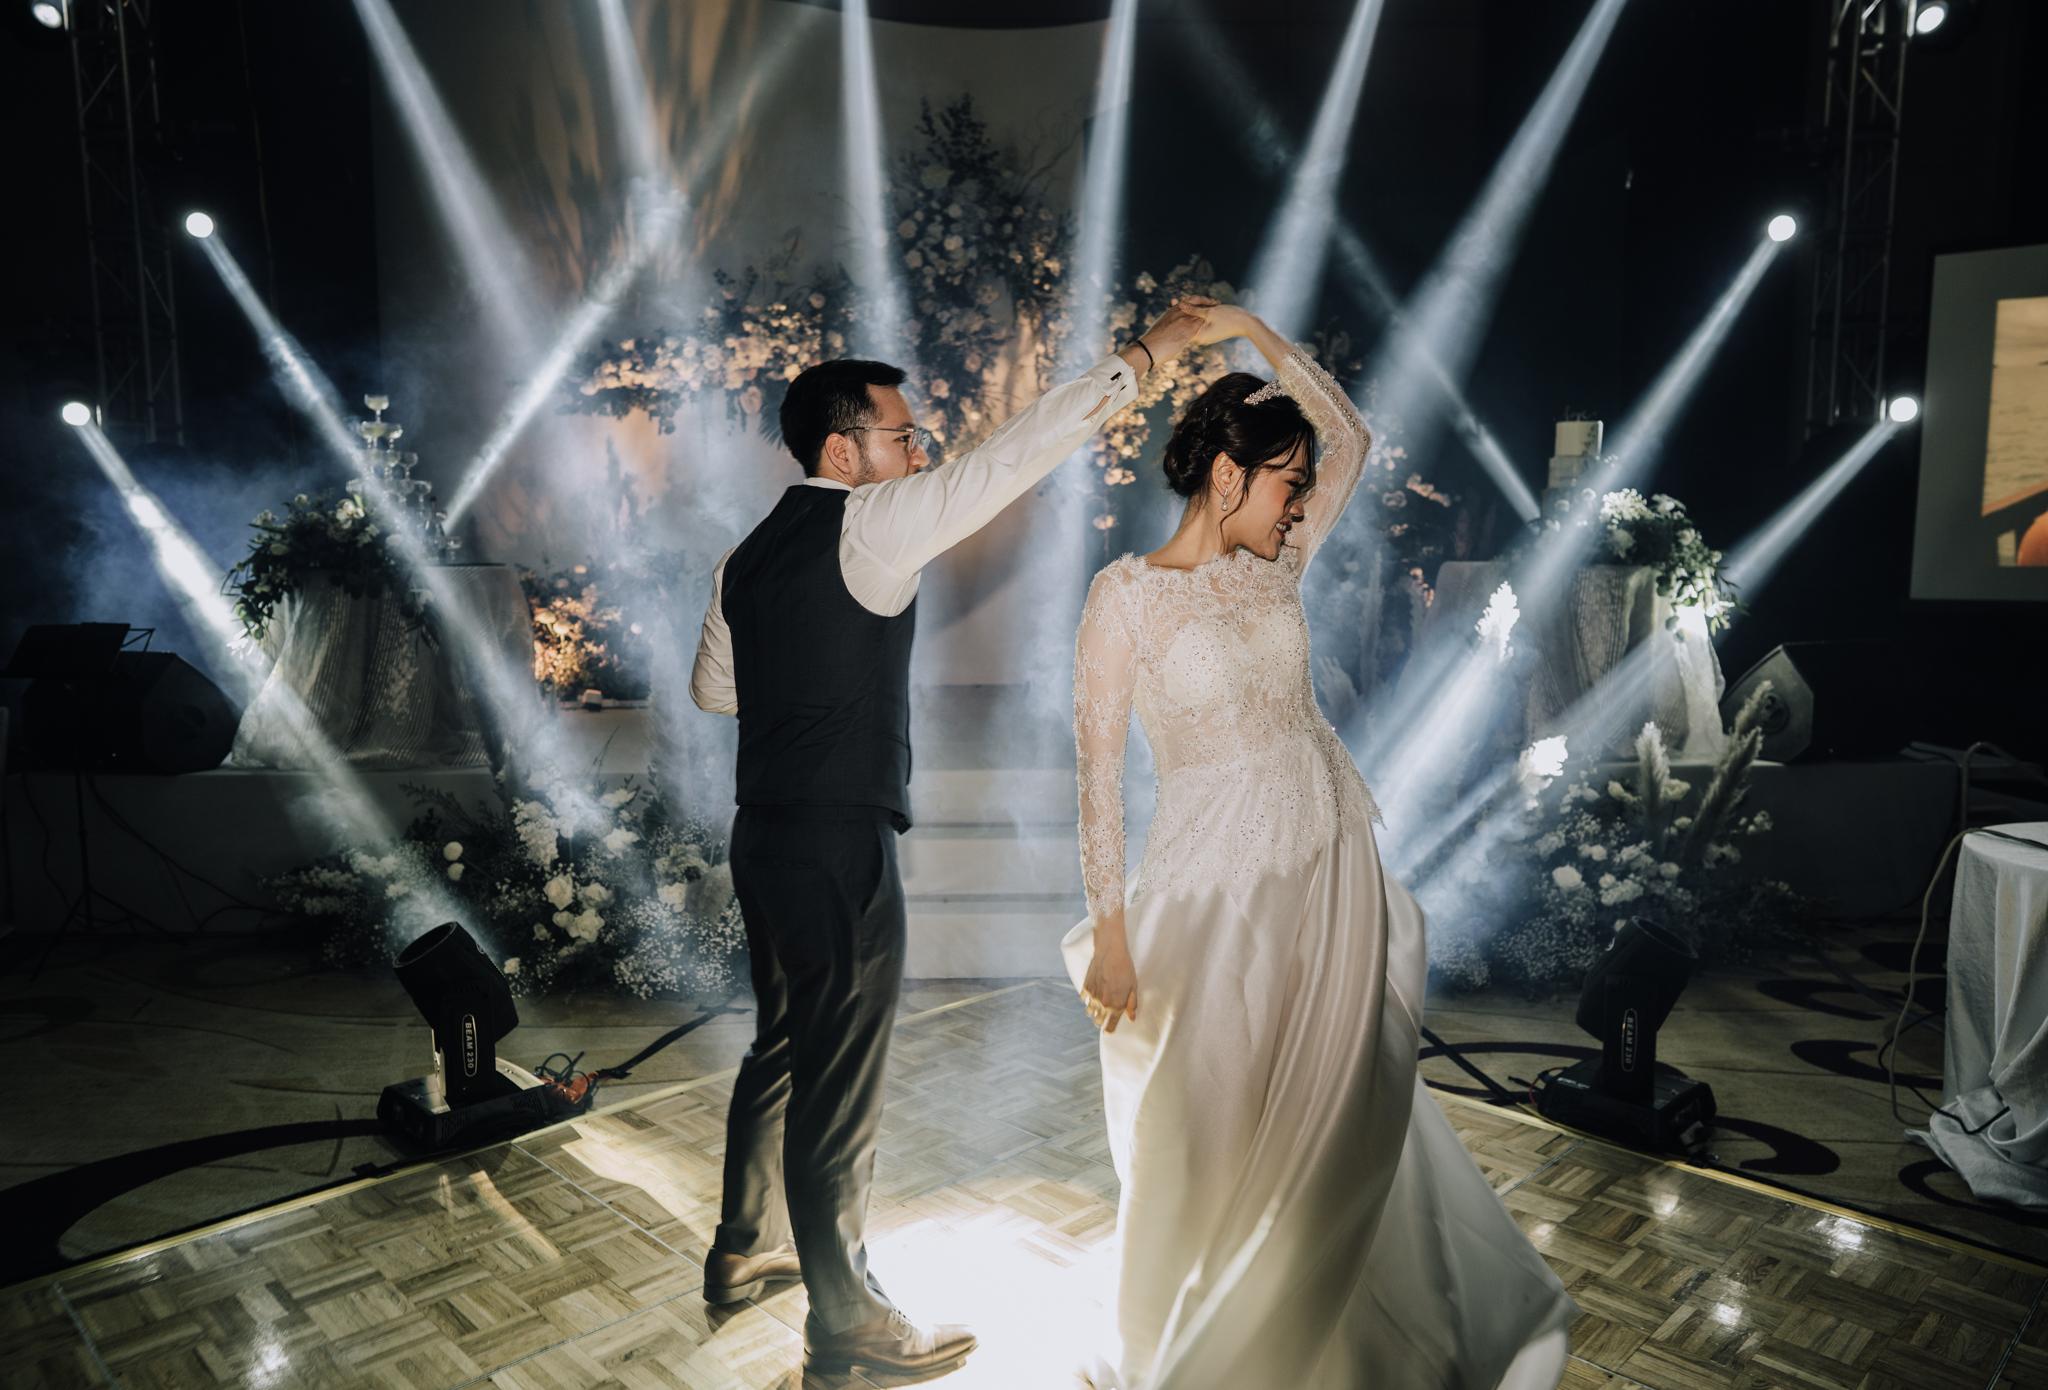 JWMarriott Ha Noi Intimate Wedding of Trang Hi well captured by Hipster Wedding Vietnam Wedding Photographer-36404.jpg